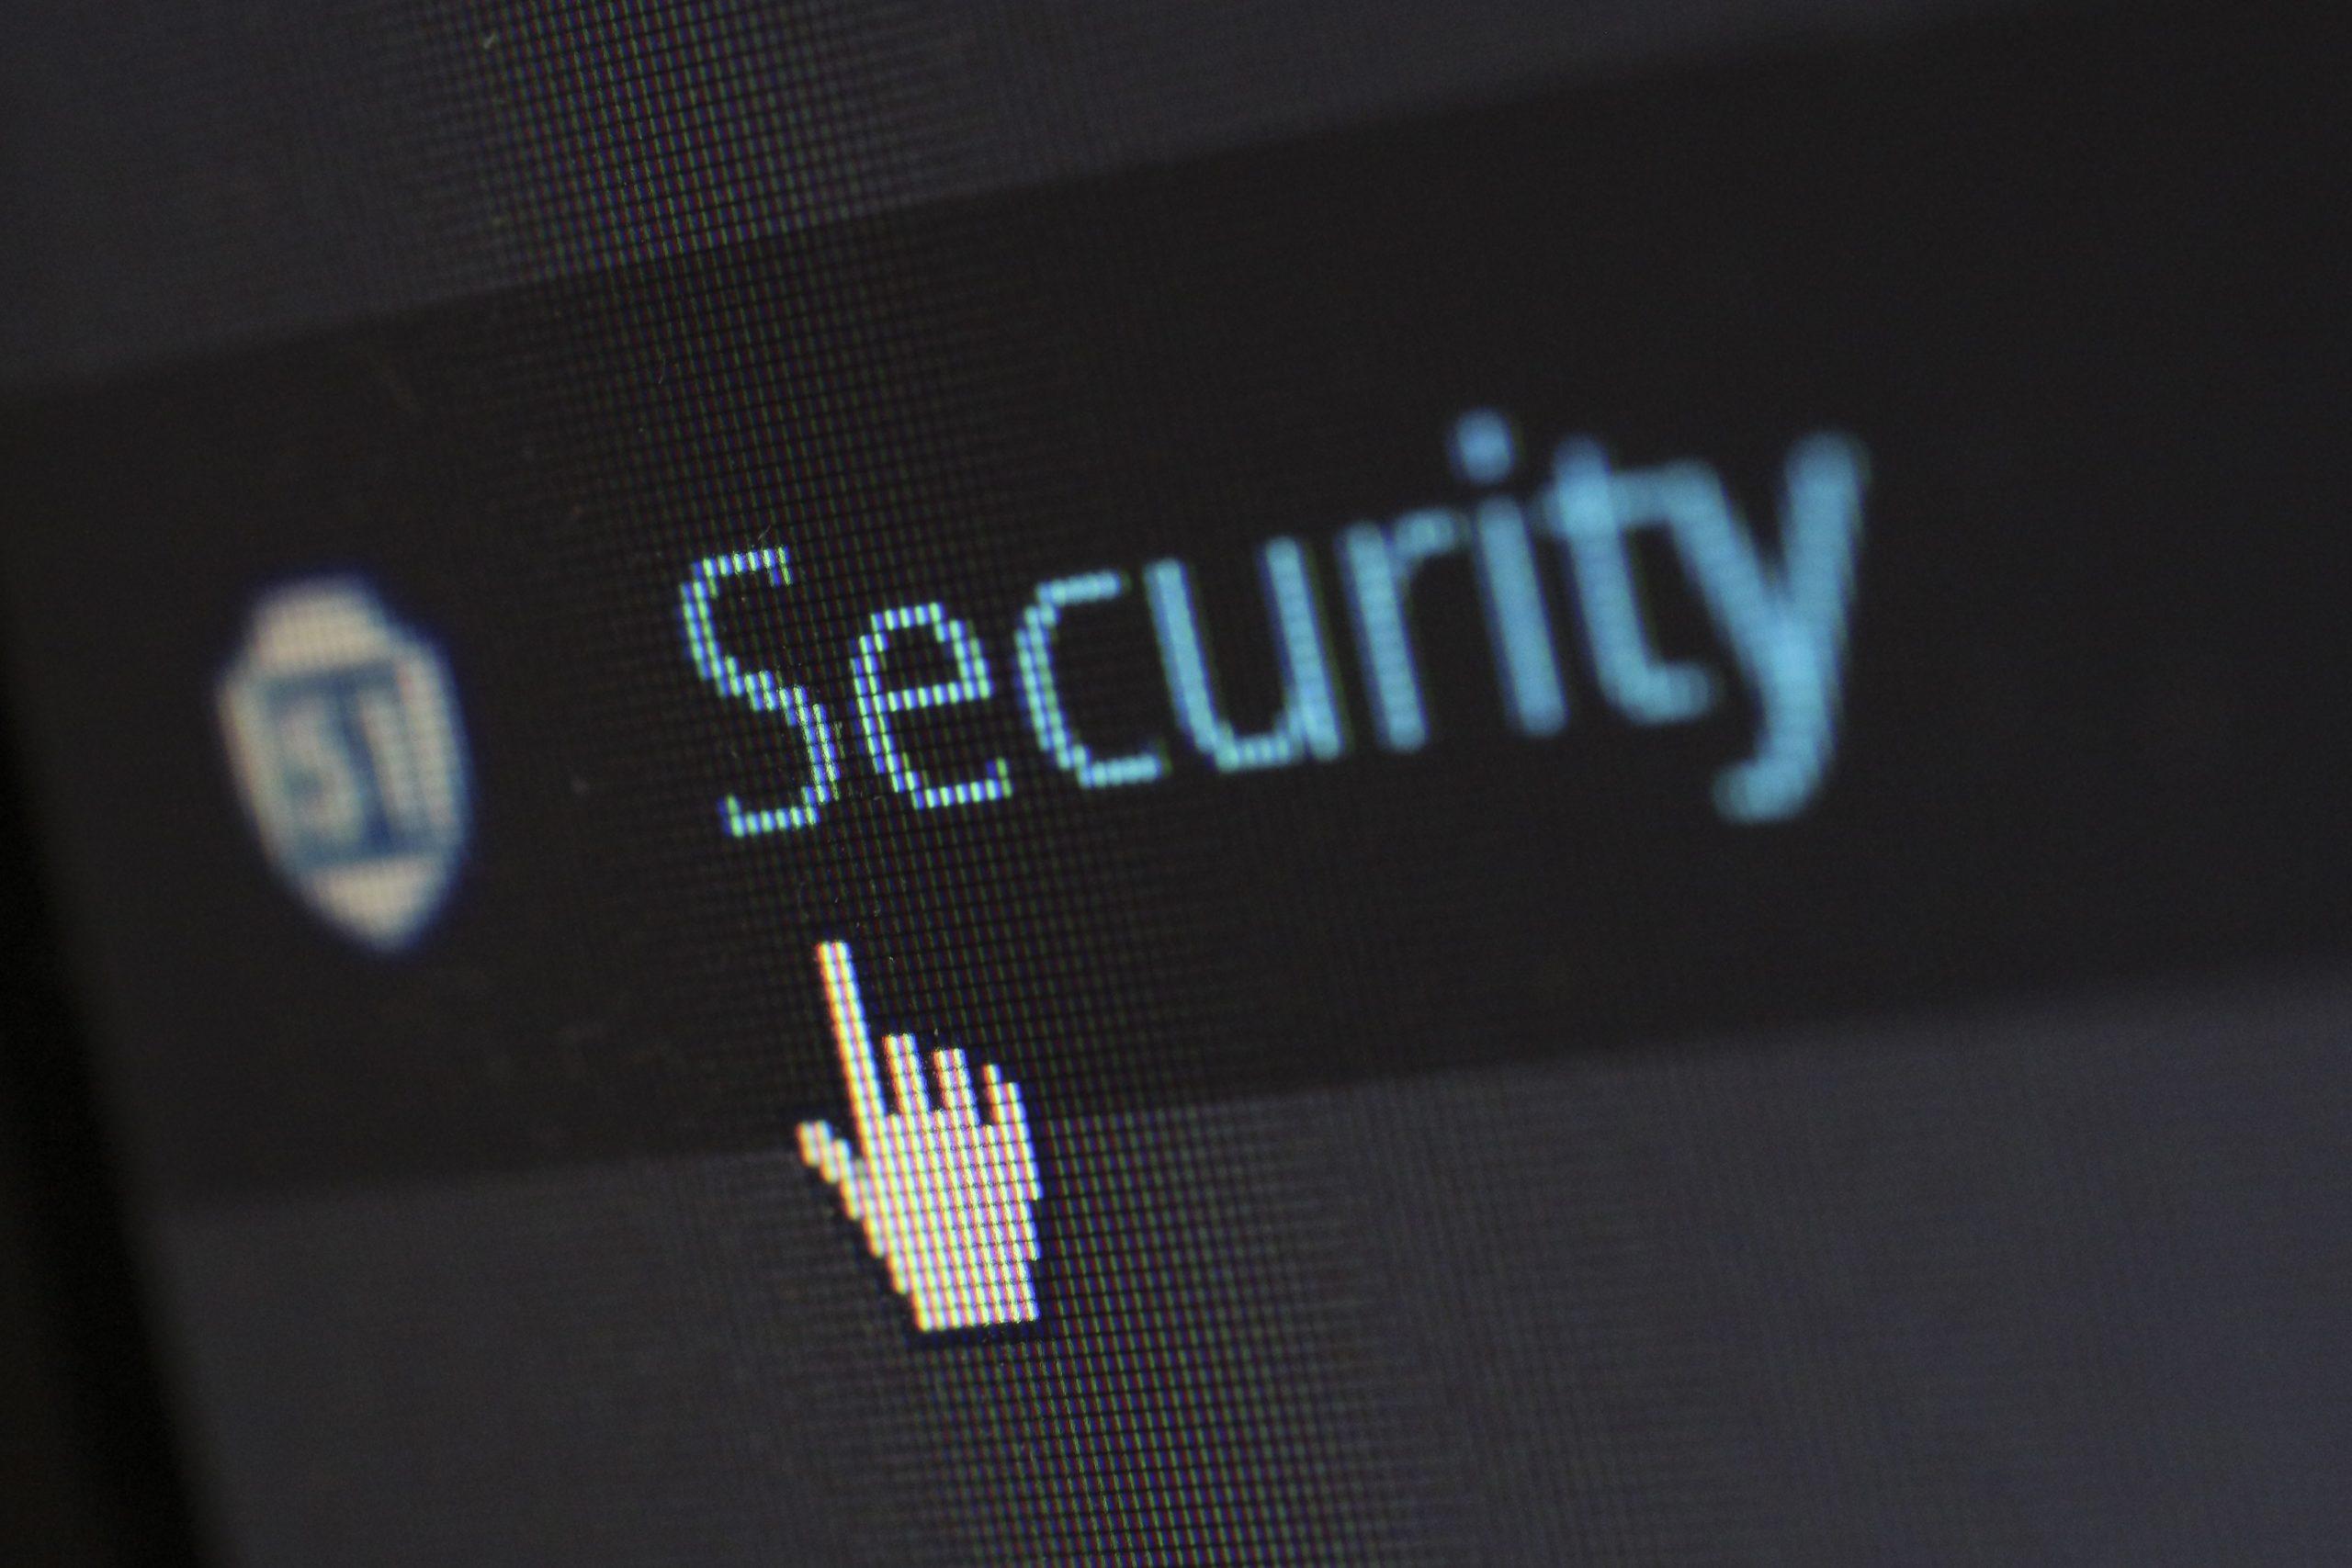 dedicated server security